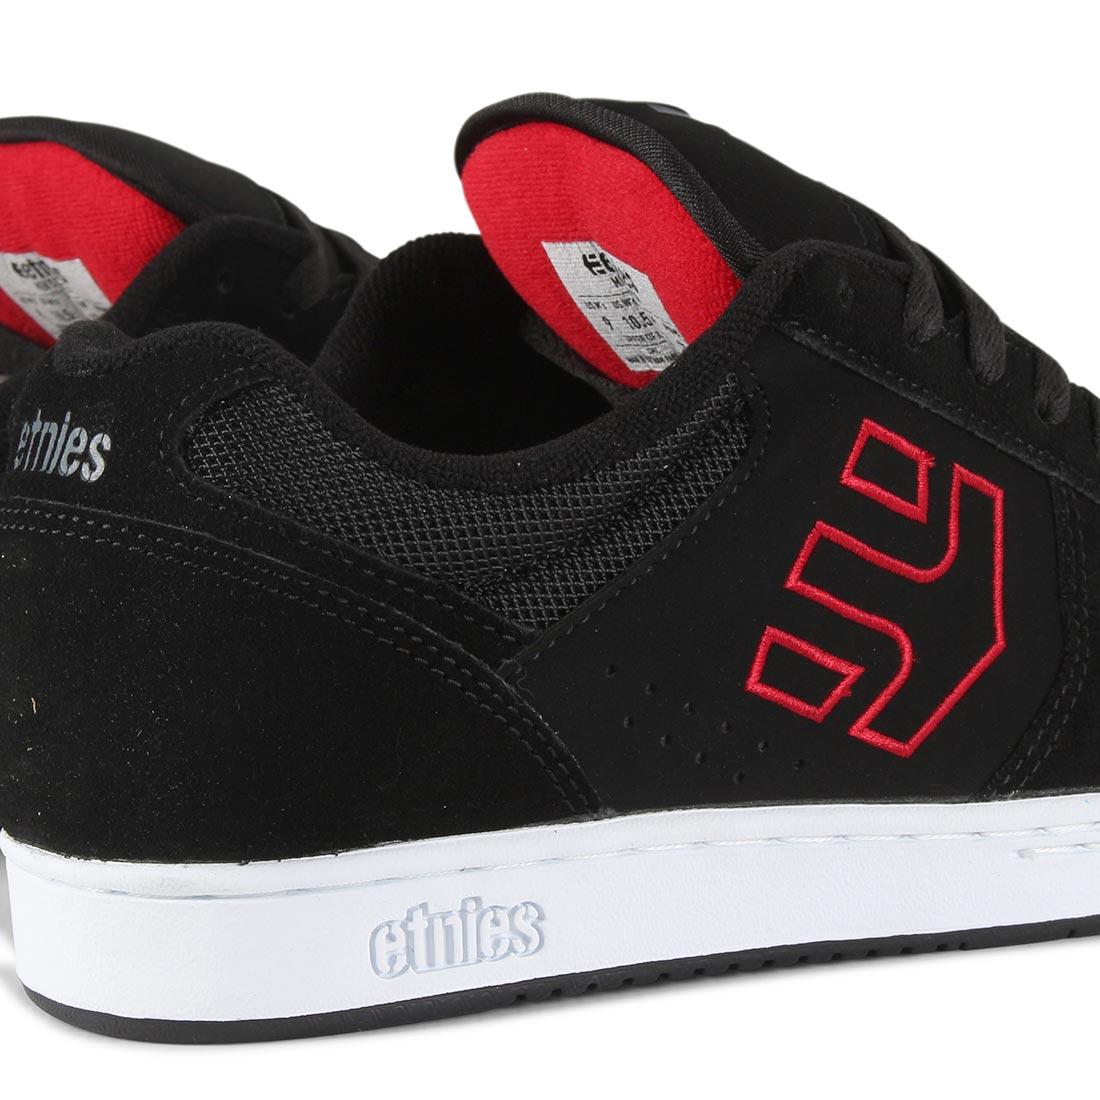 Etnies Swivel Shoes - Black / Red